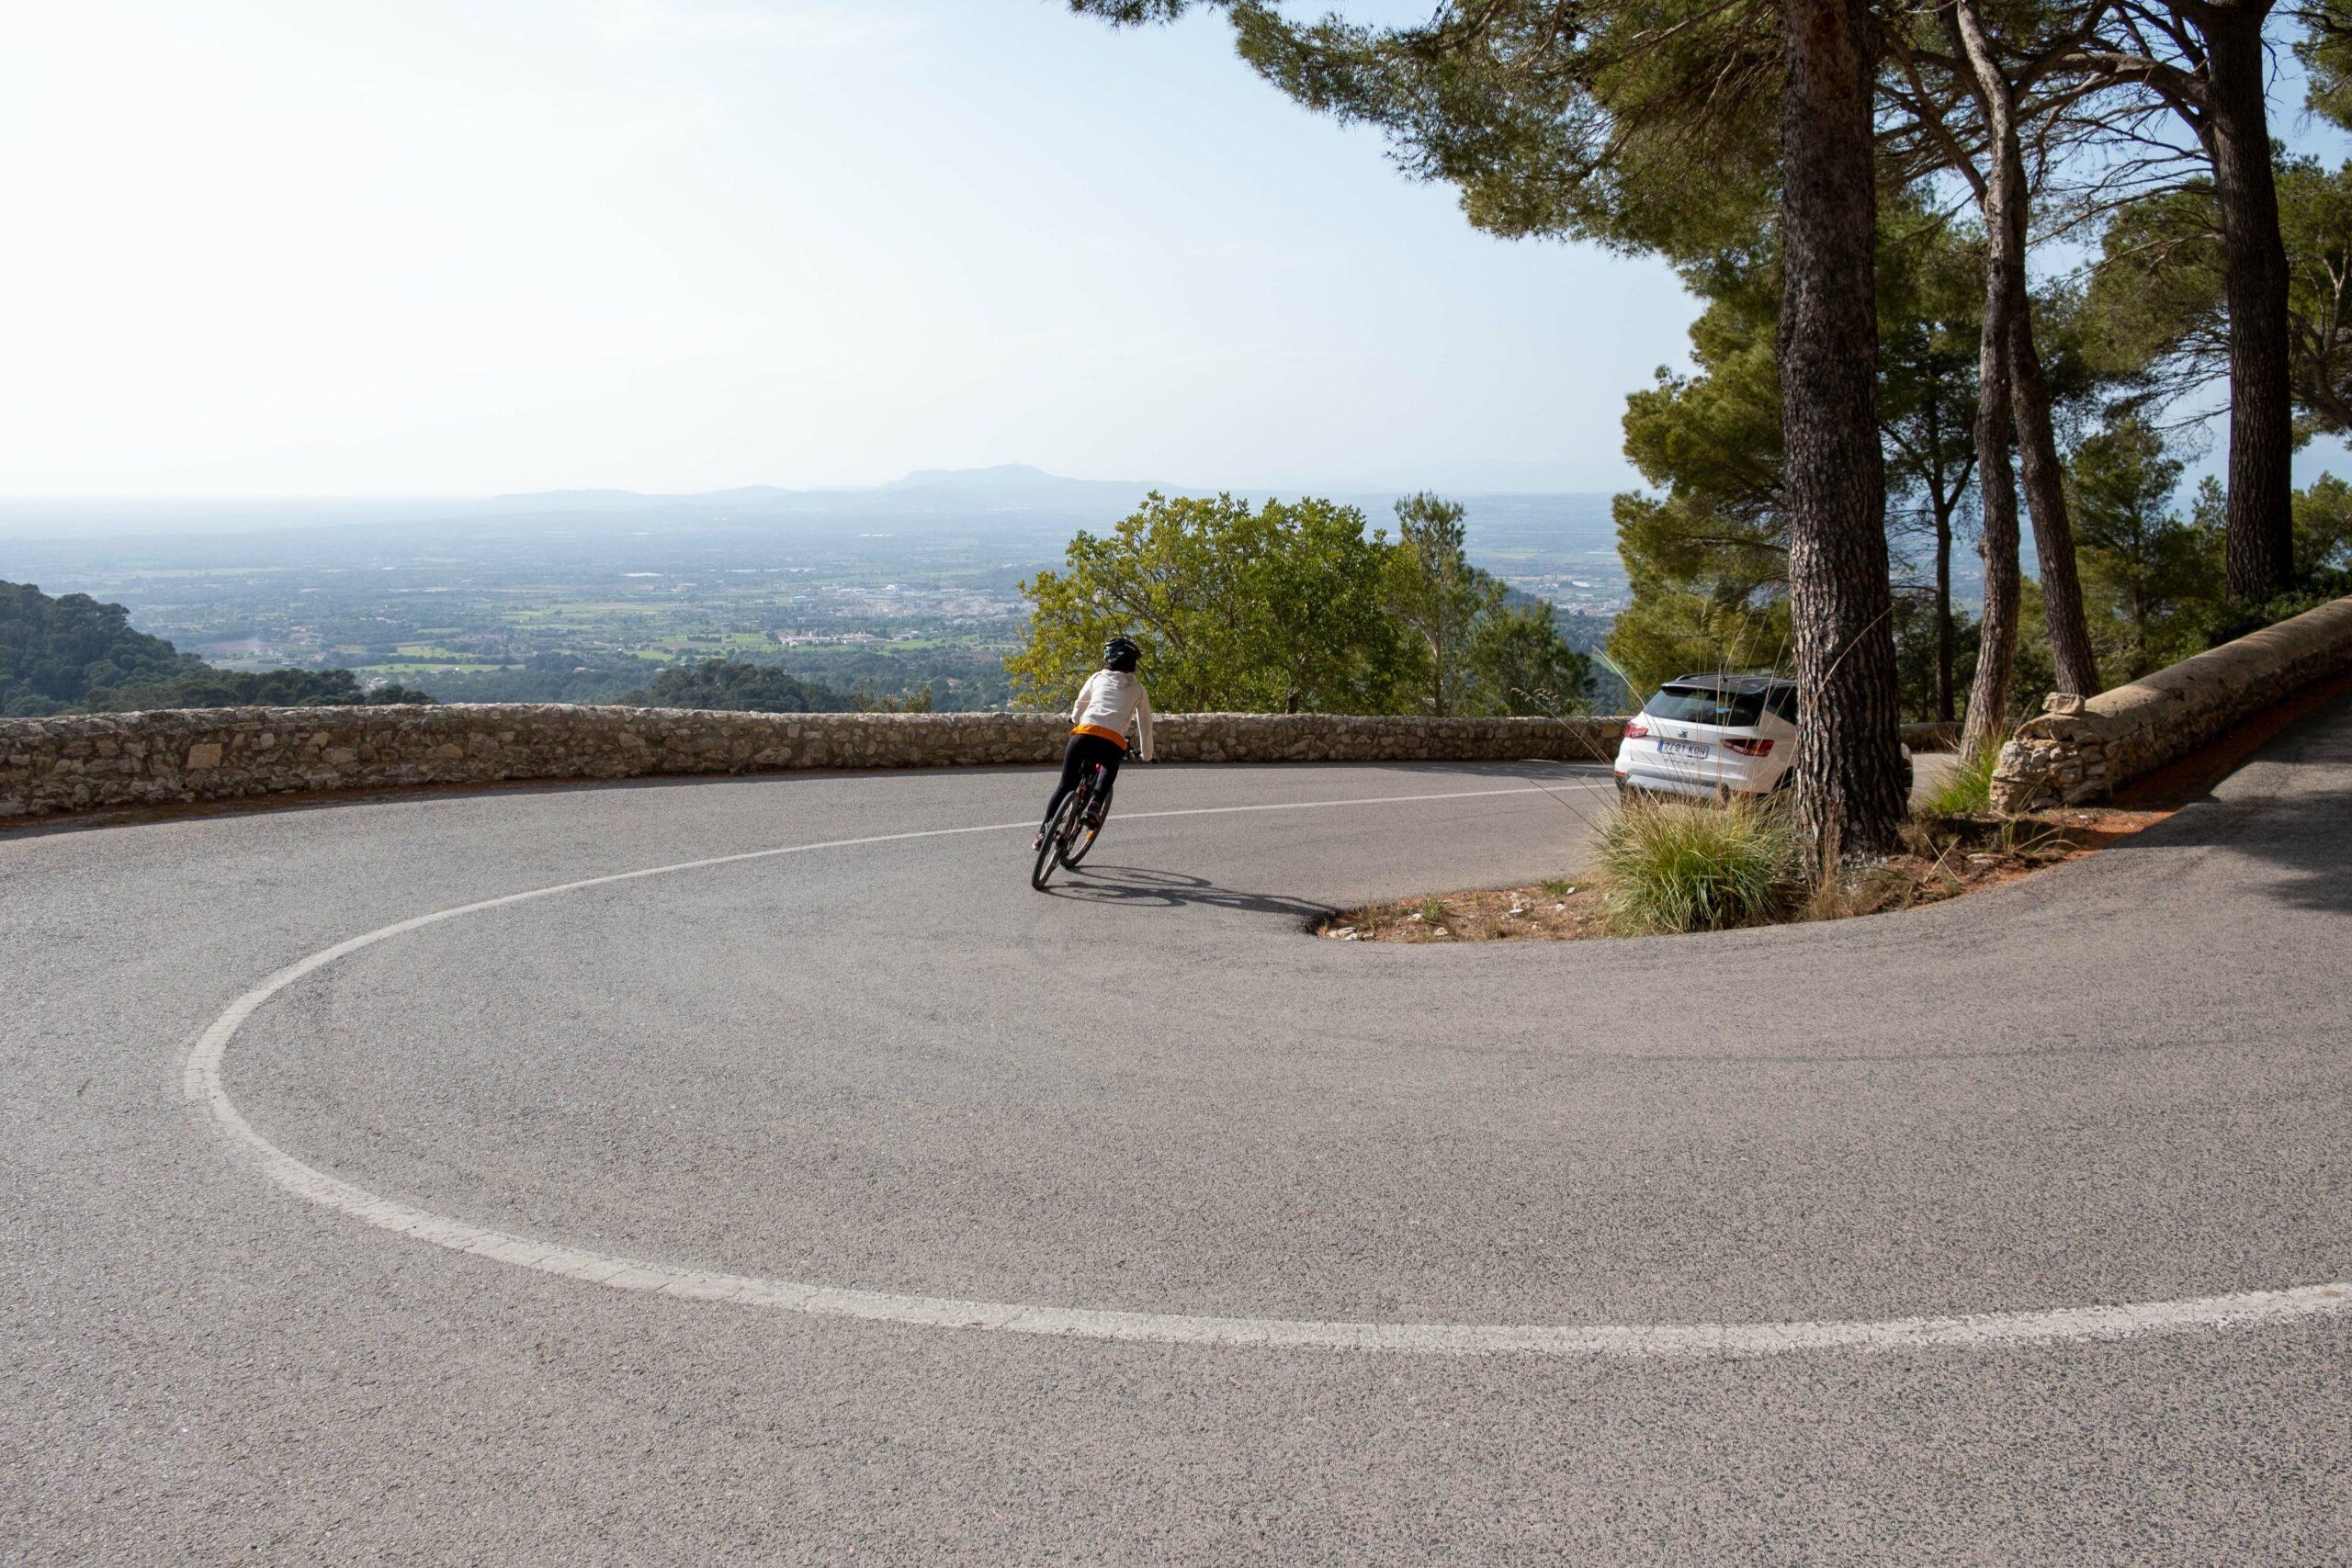 The long and winding road: Sant Salvador - Estilo Palma